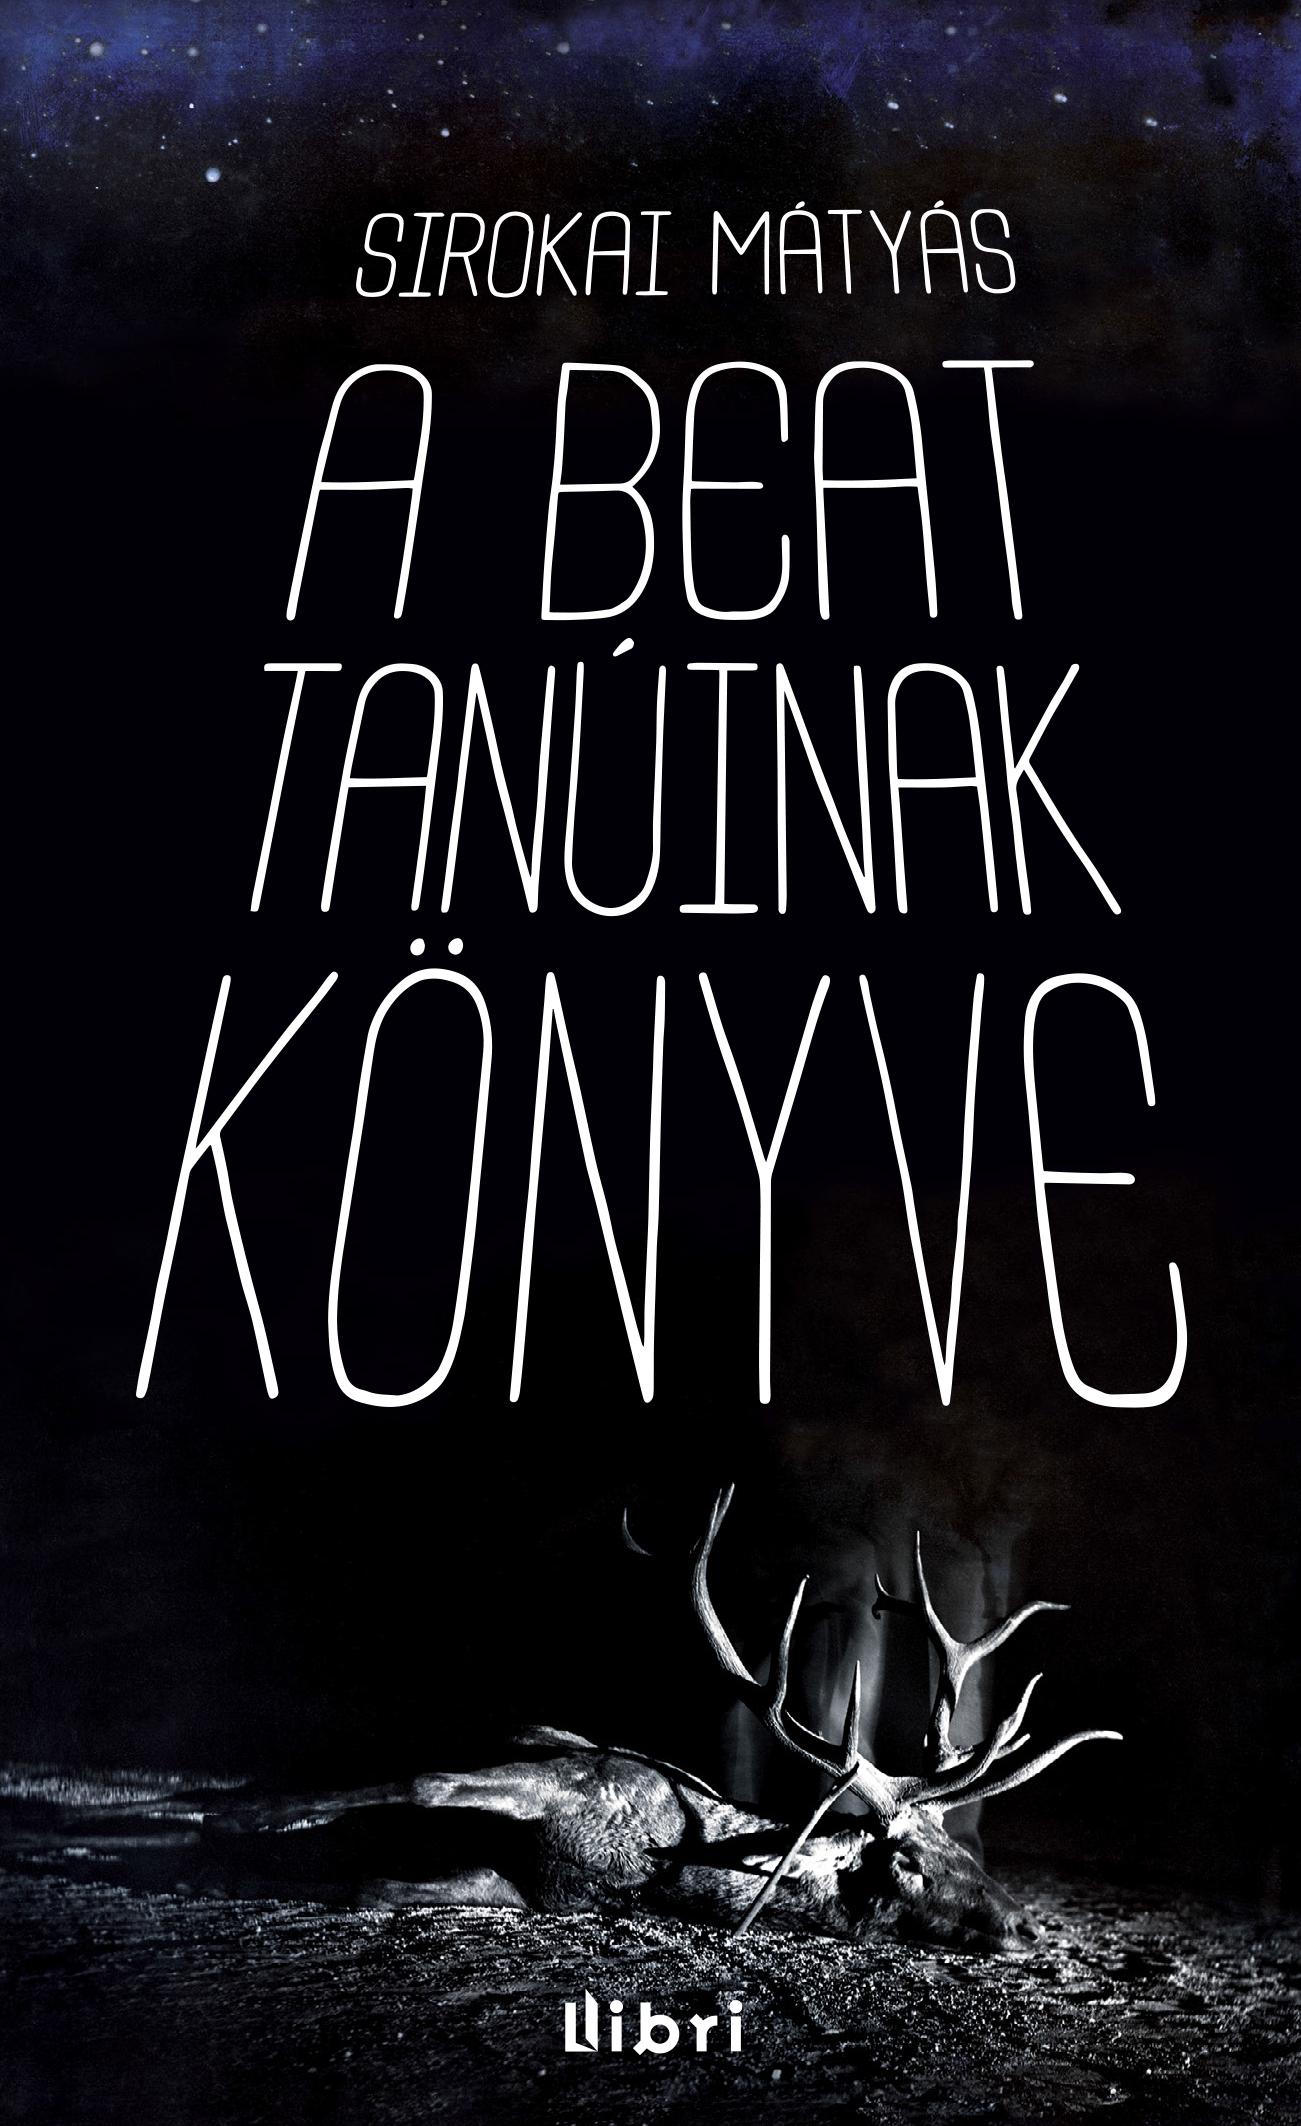 A_beat_tanuinak_konyve_kiteritett-1